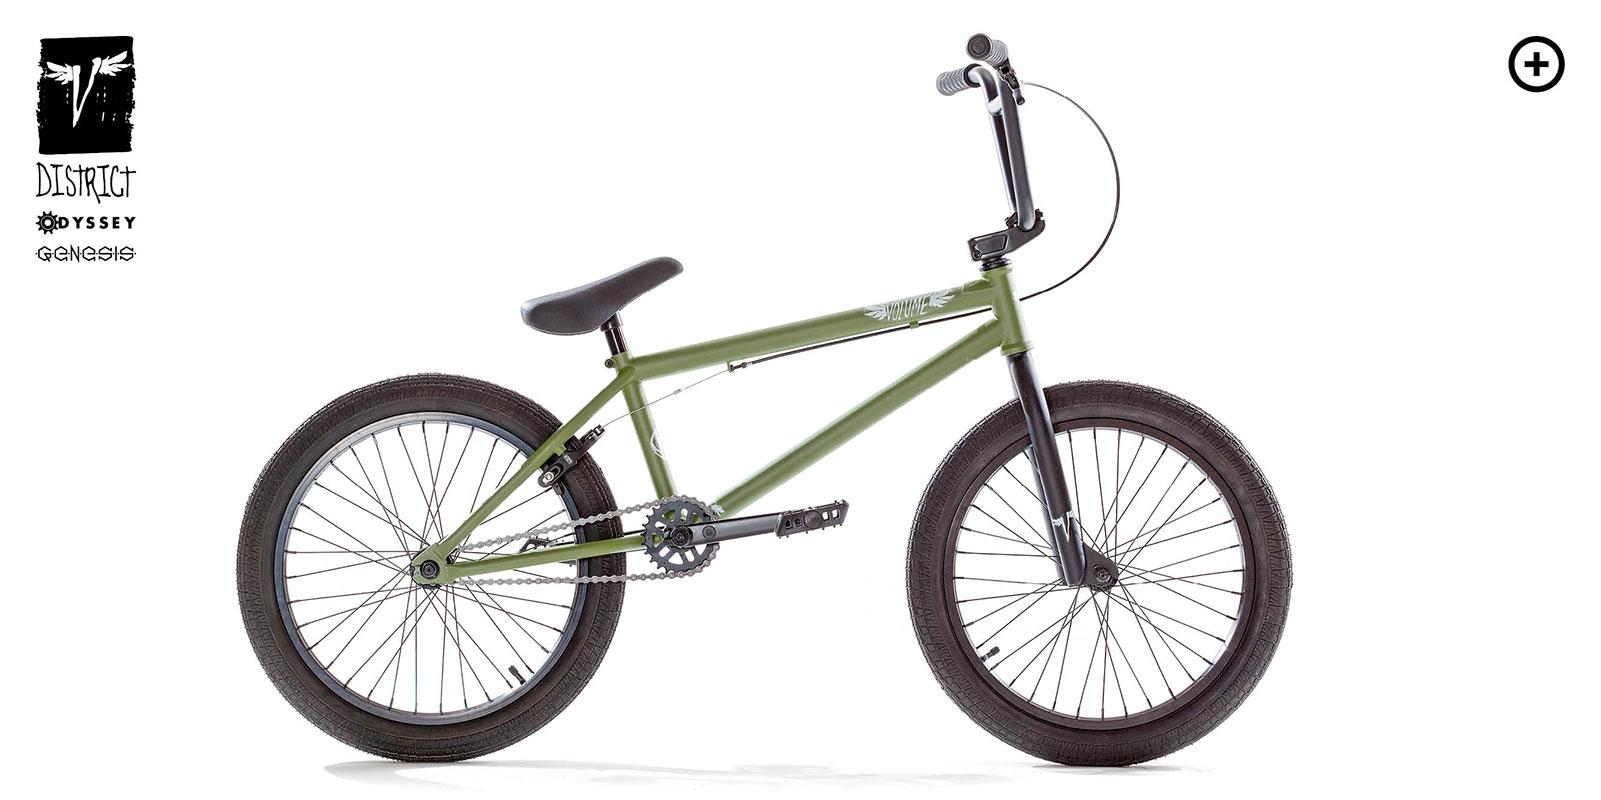 District – Volume Bikes